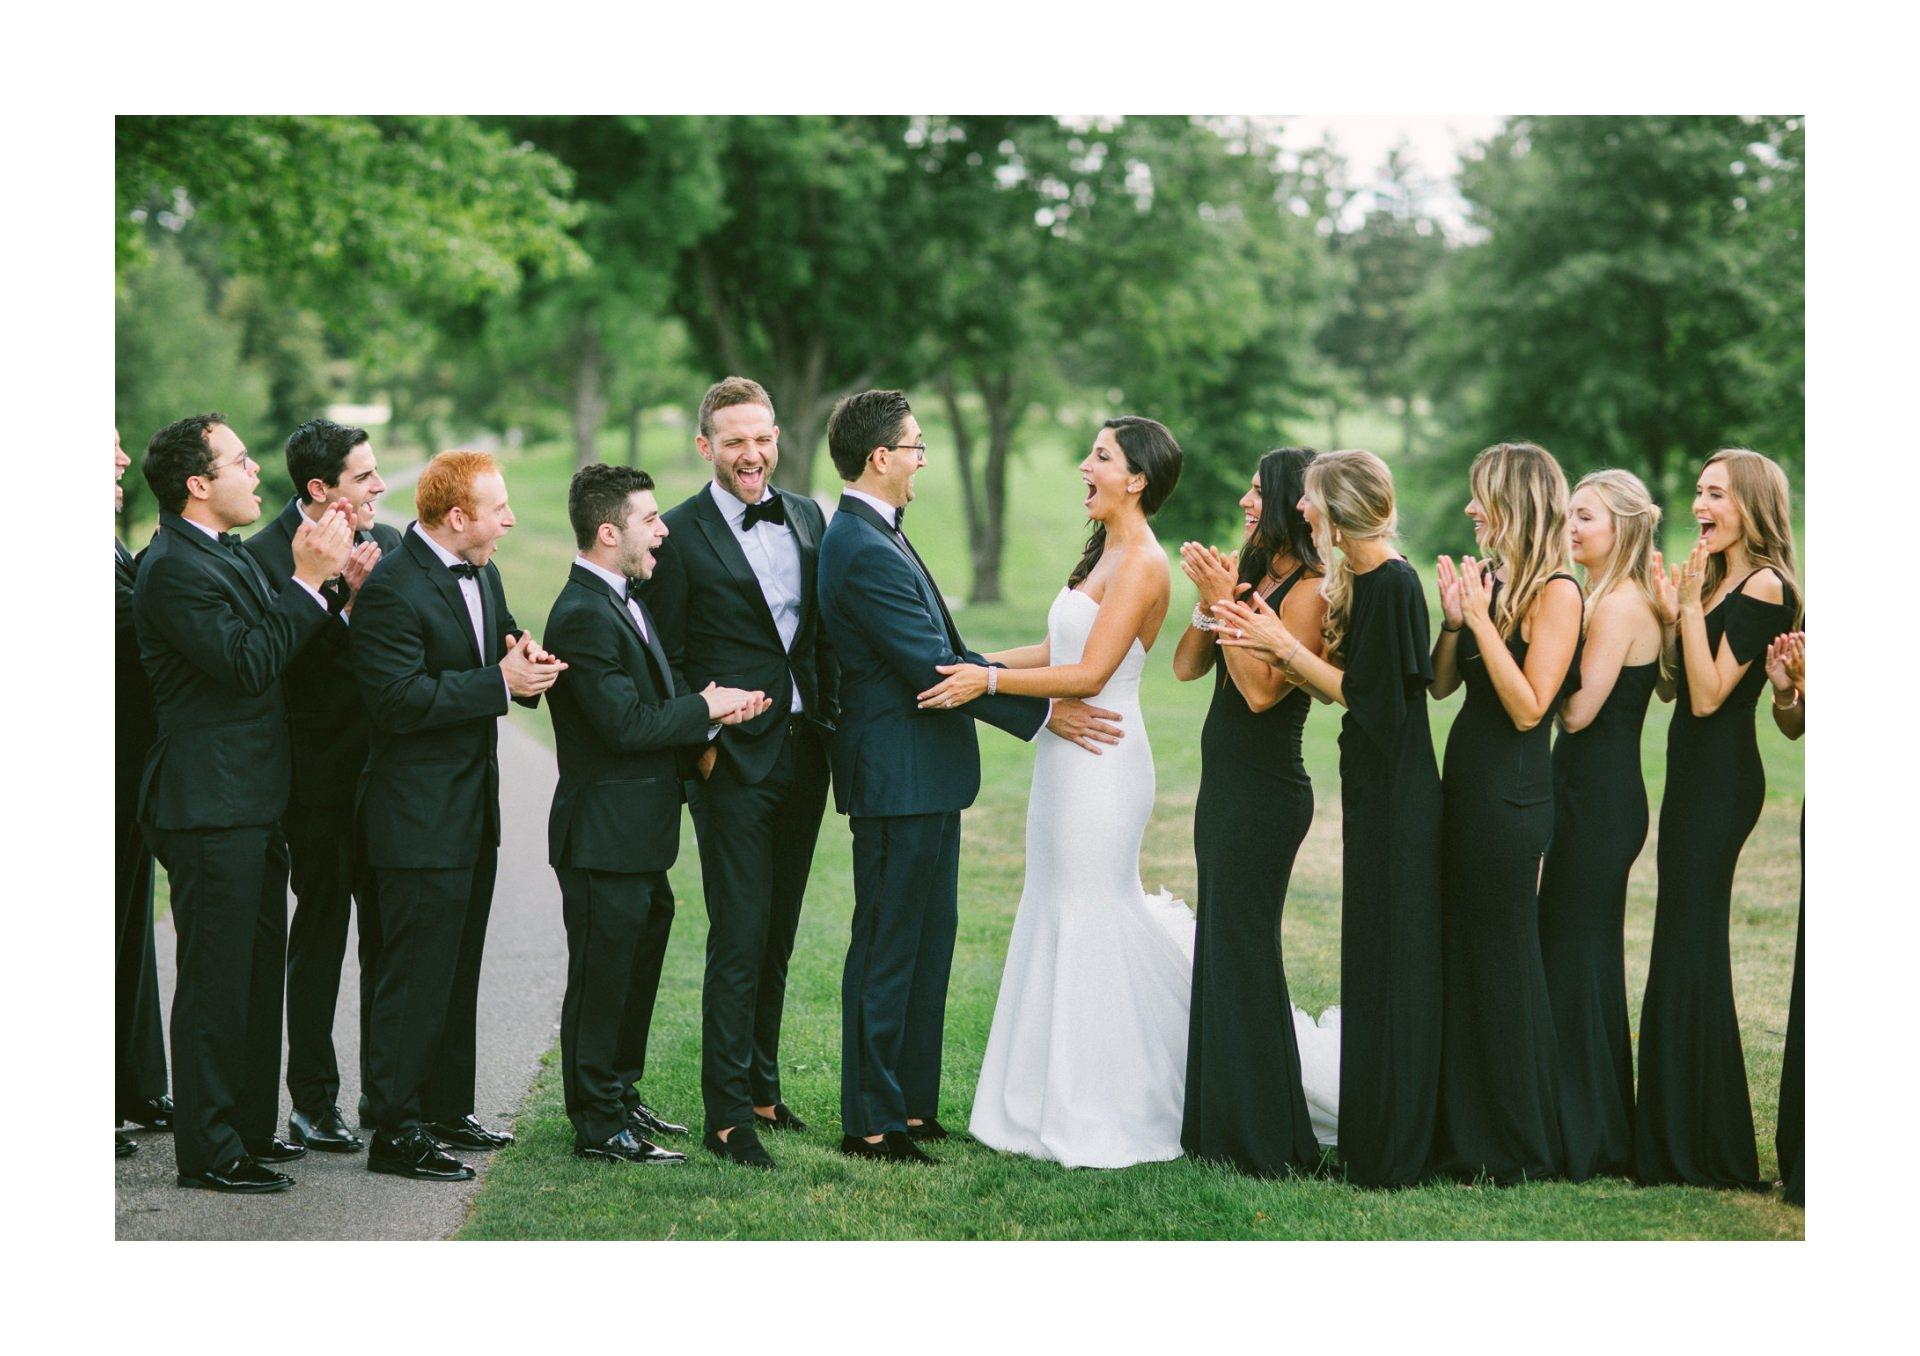 Beechmont Country Club Wedding Photographer in Beachwood 1 37.jpg